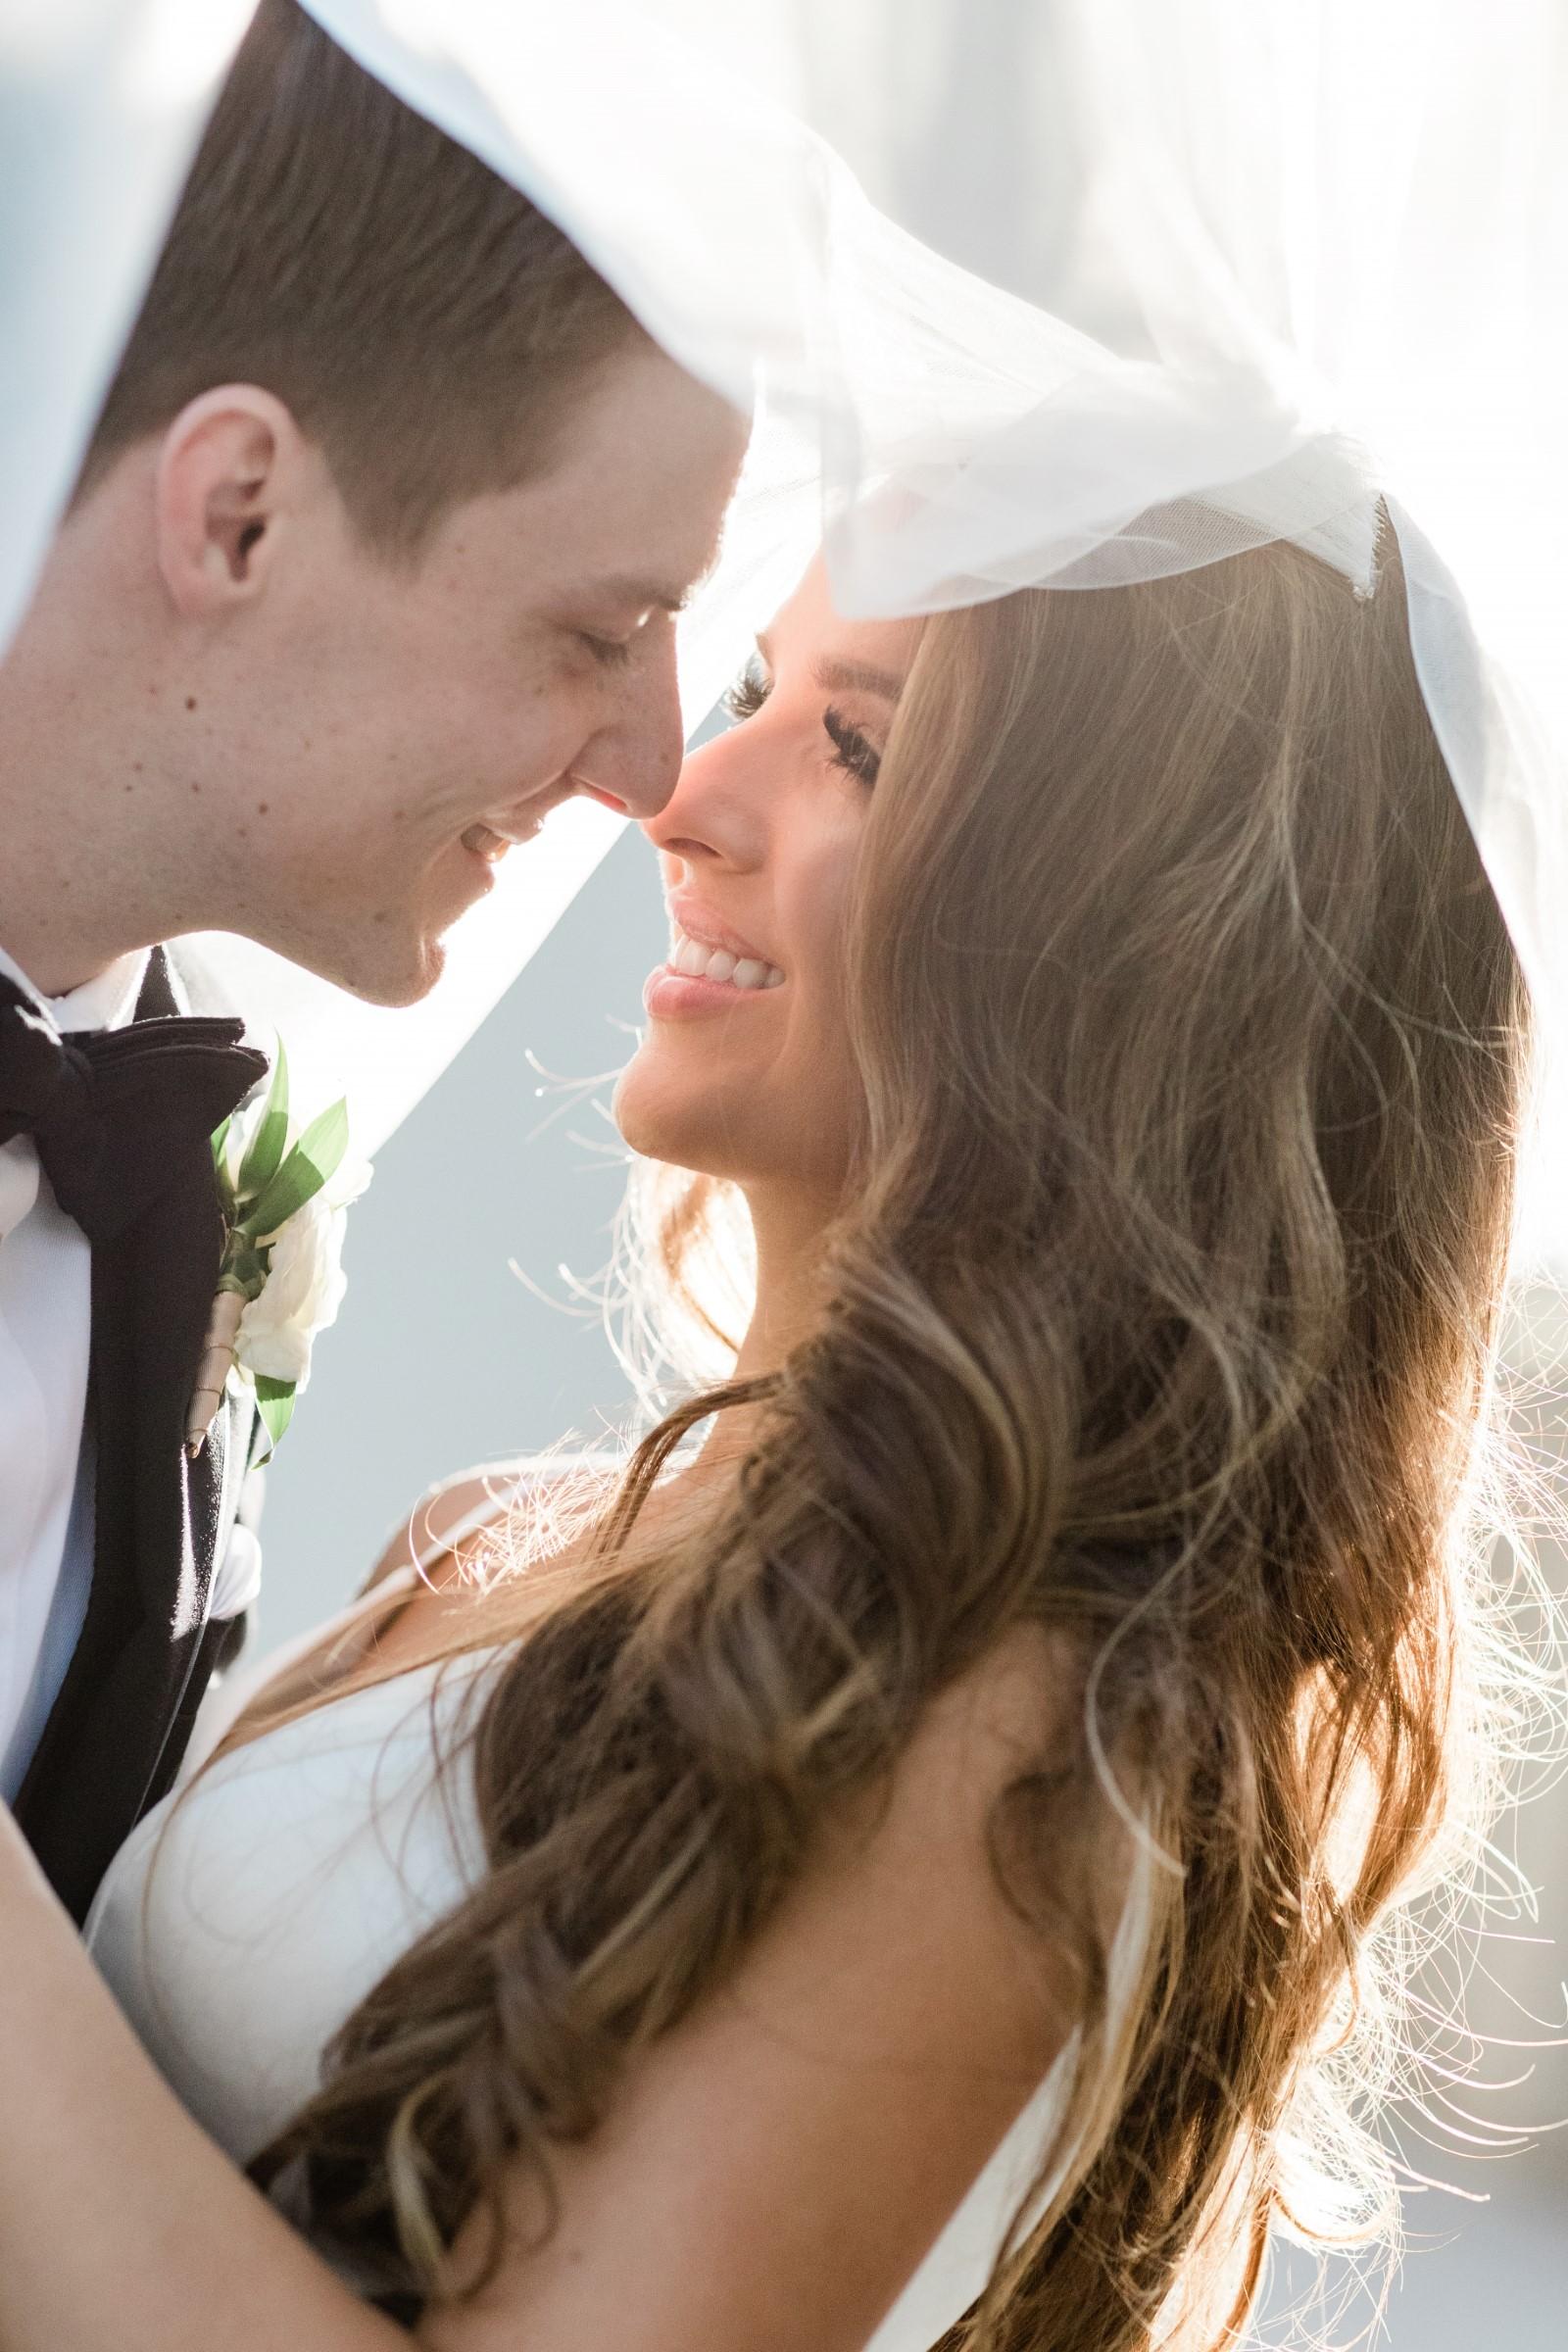 spray tan photo session los angeles wedding couple